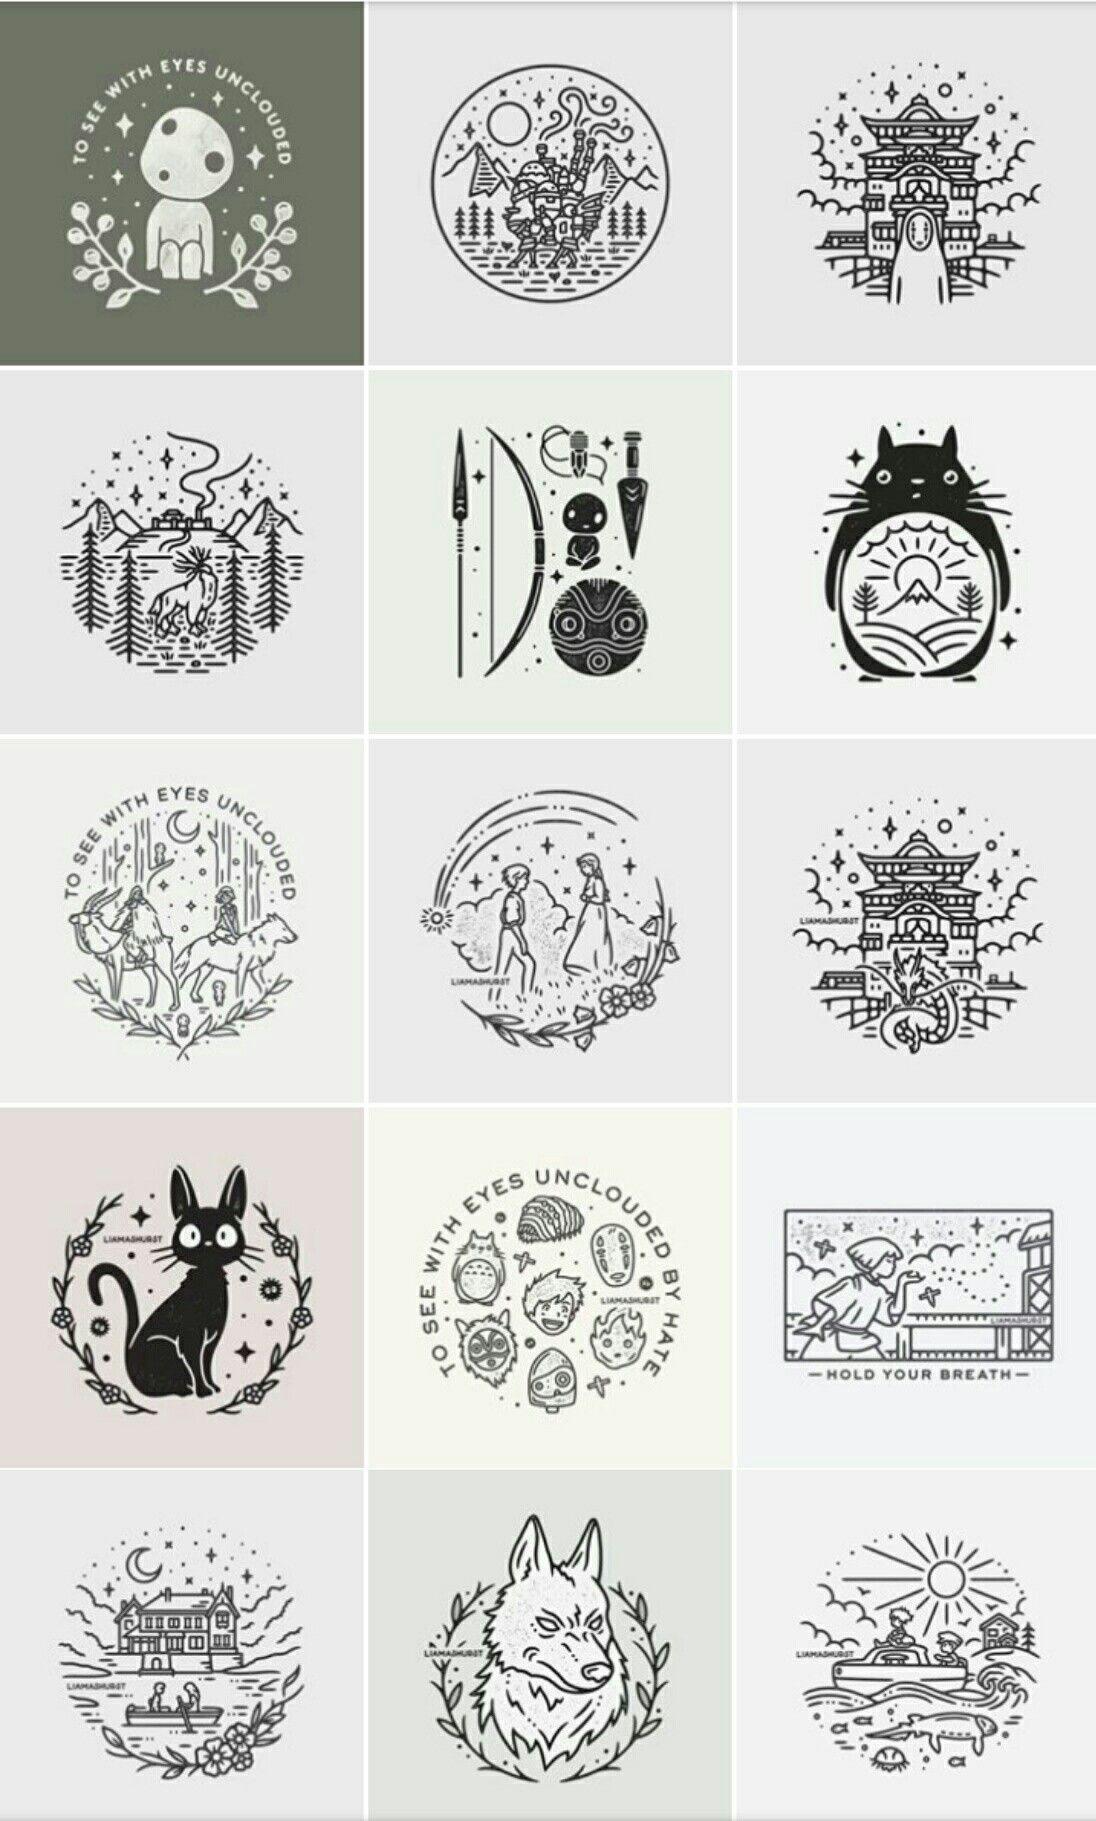 Photo of Studio Ghibli doodles by Liamashurst